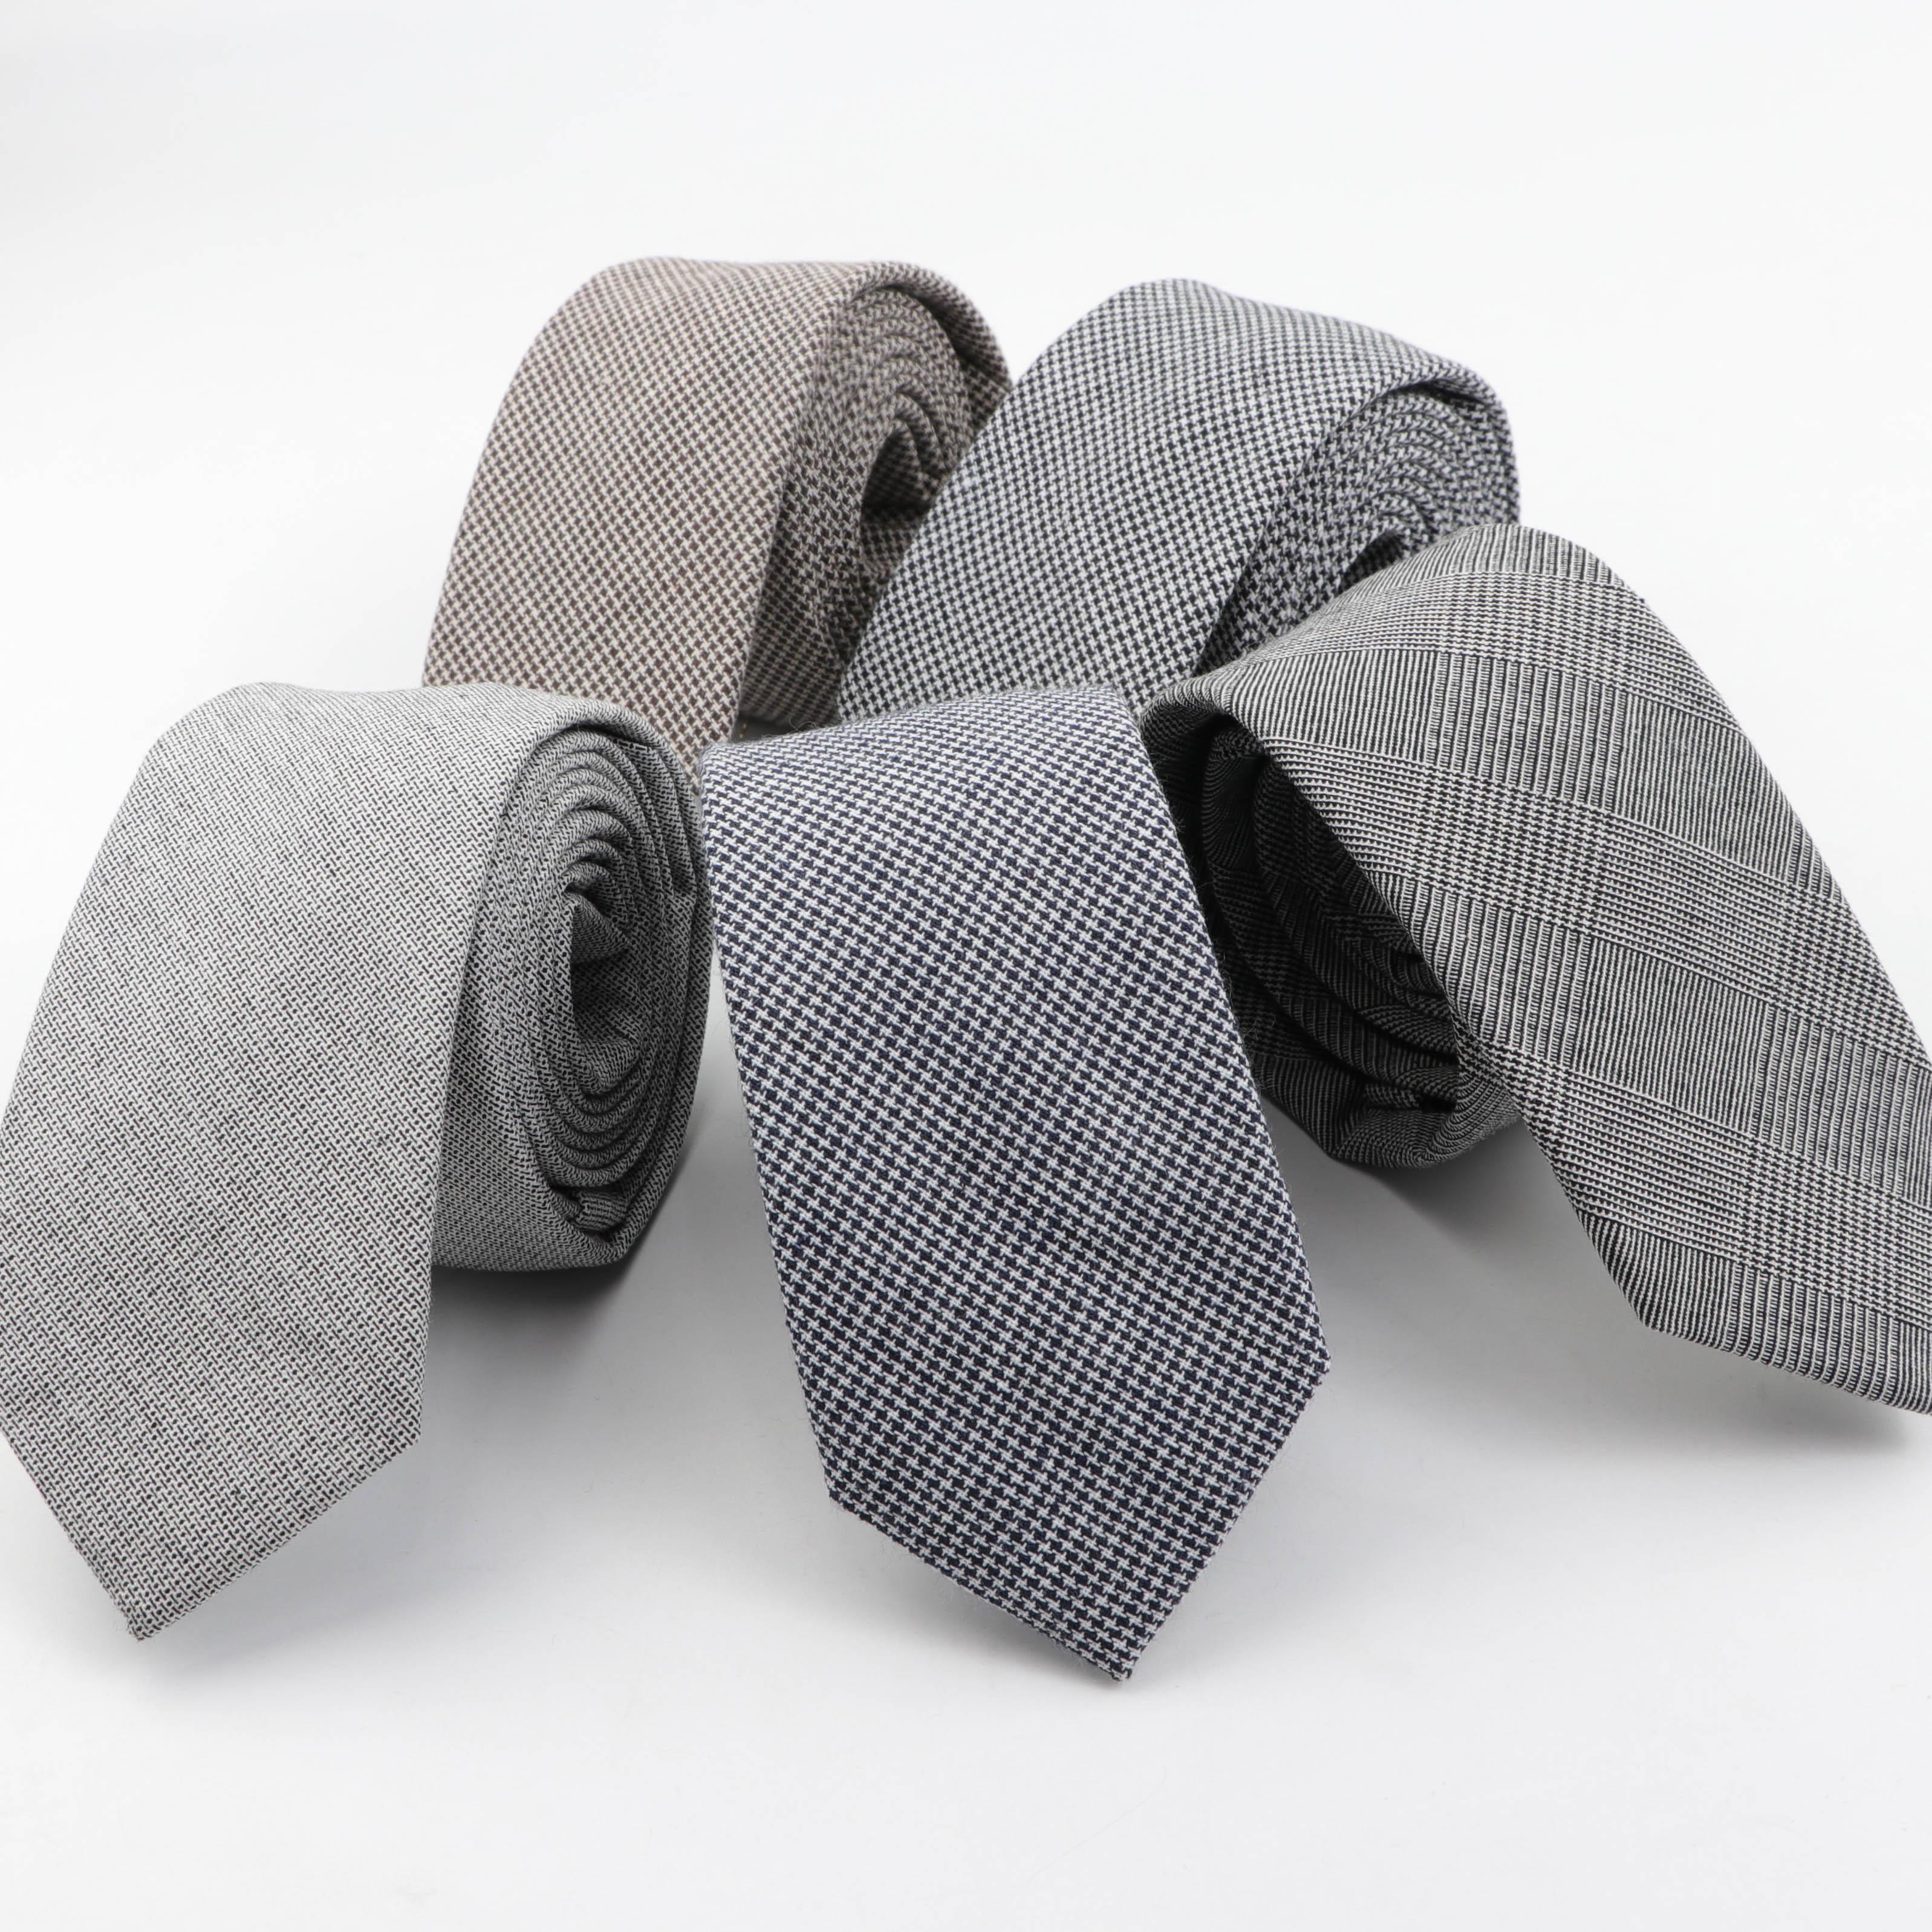 Striped Color 6cm Tie Cotton Pure Colorful Slim Neckties For Wedding Ties Skinny Groom Necktie For Men